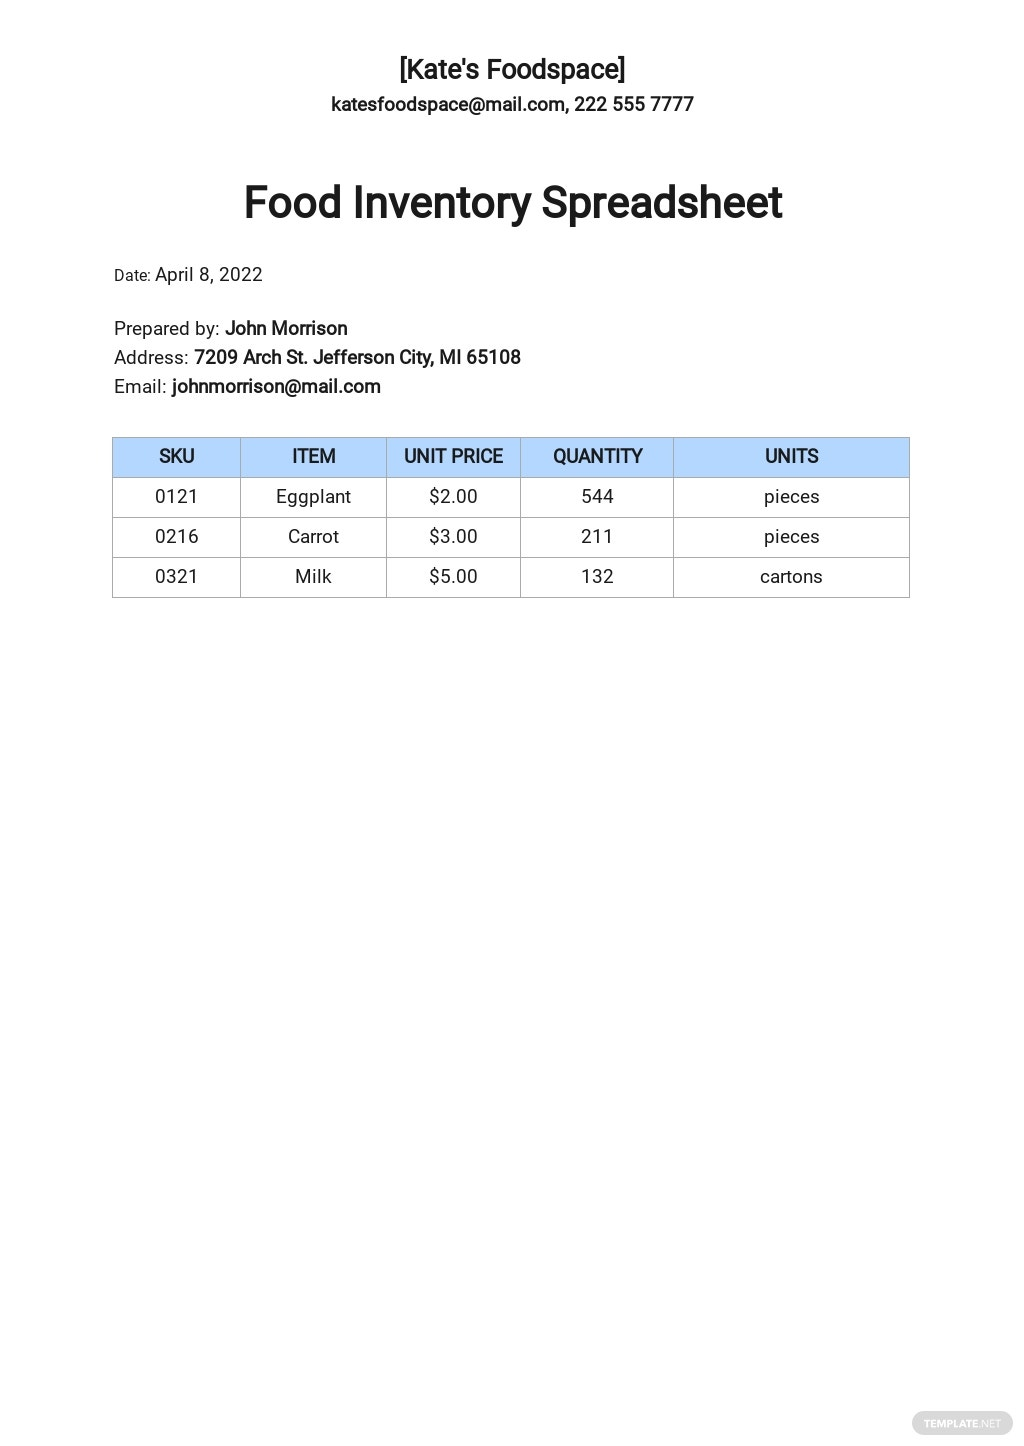 Free Food Inventory Spreadsheet Template.jpe